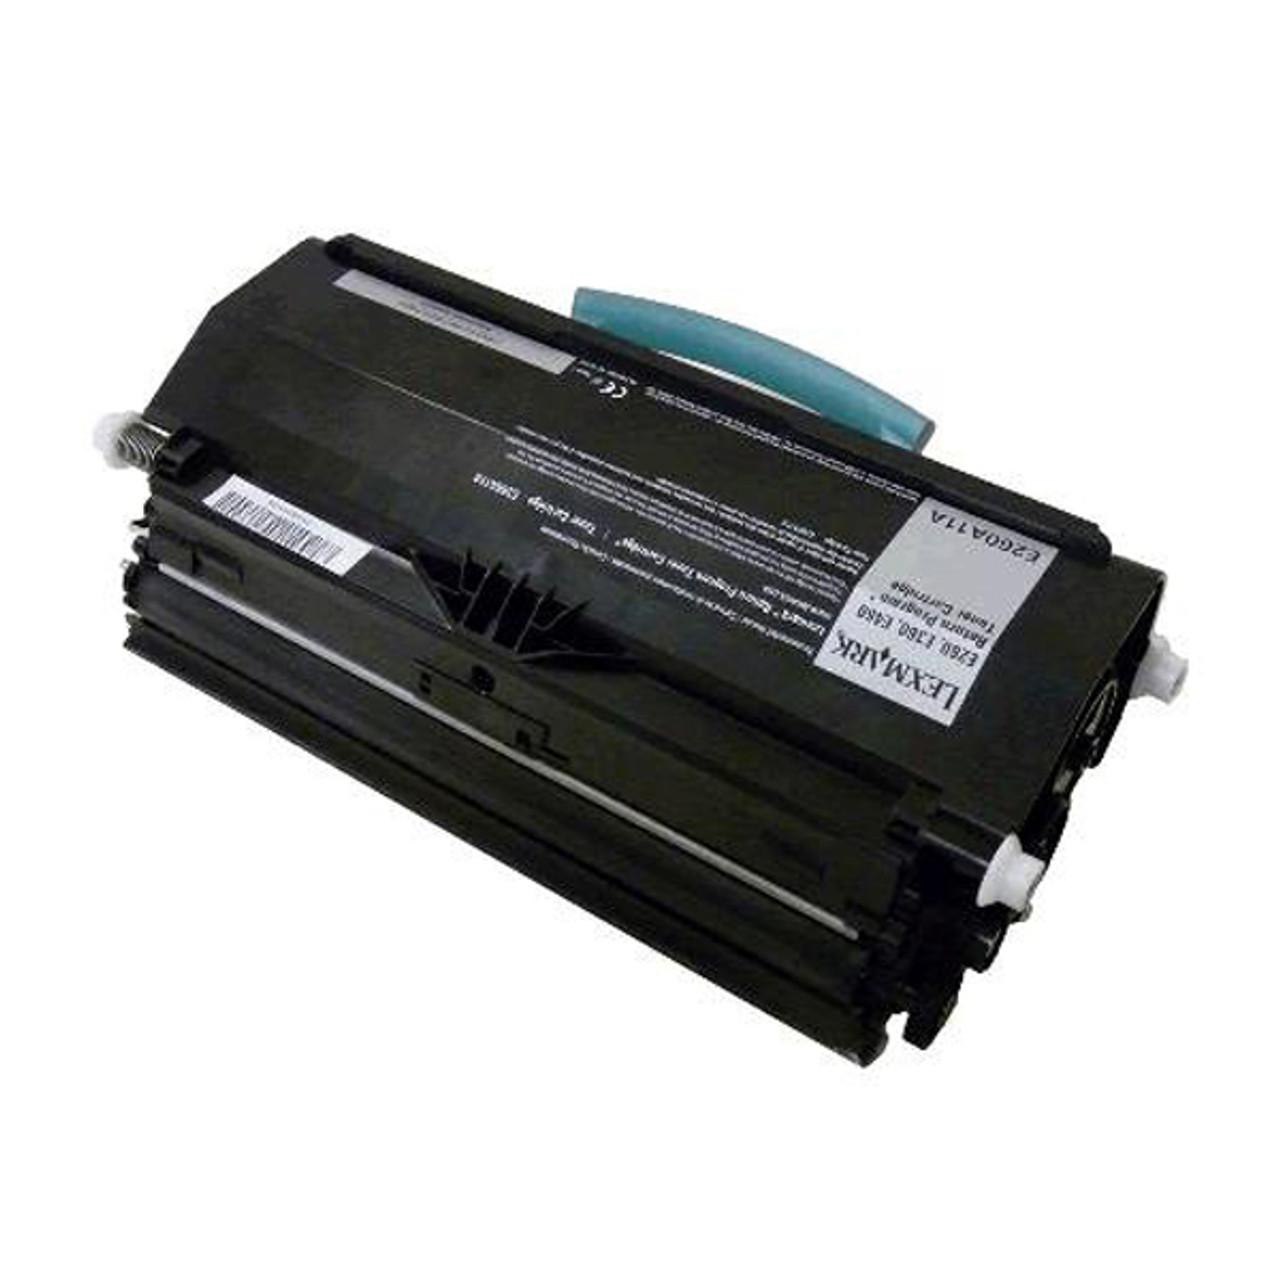 Lexmark e360/ e460 Toner Cartridge - Compatible